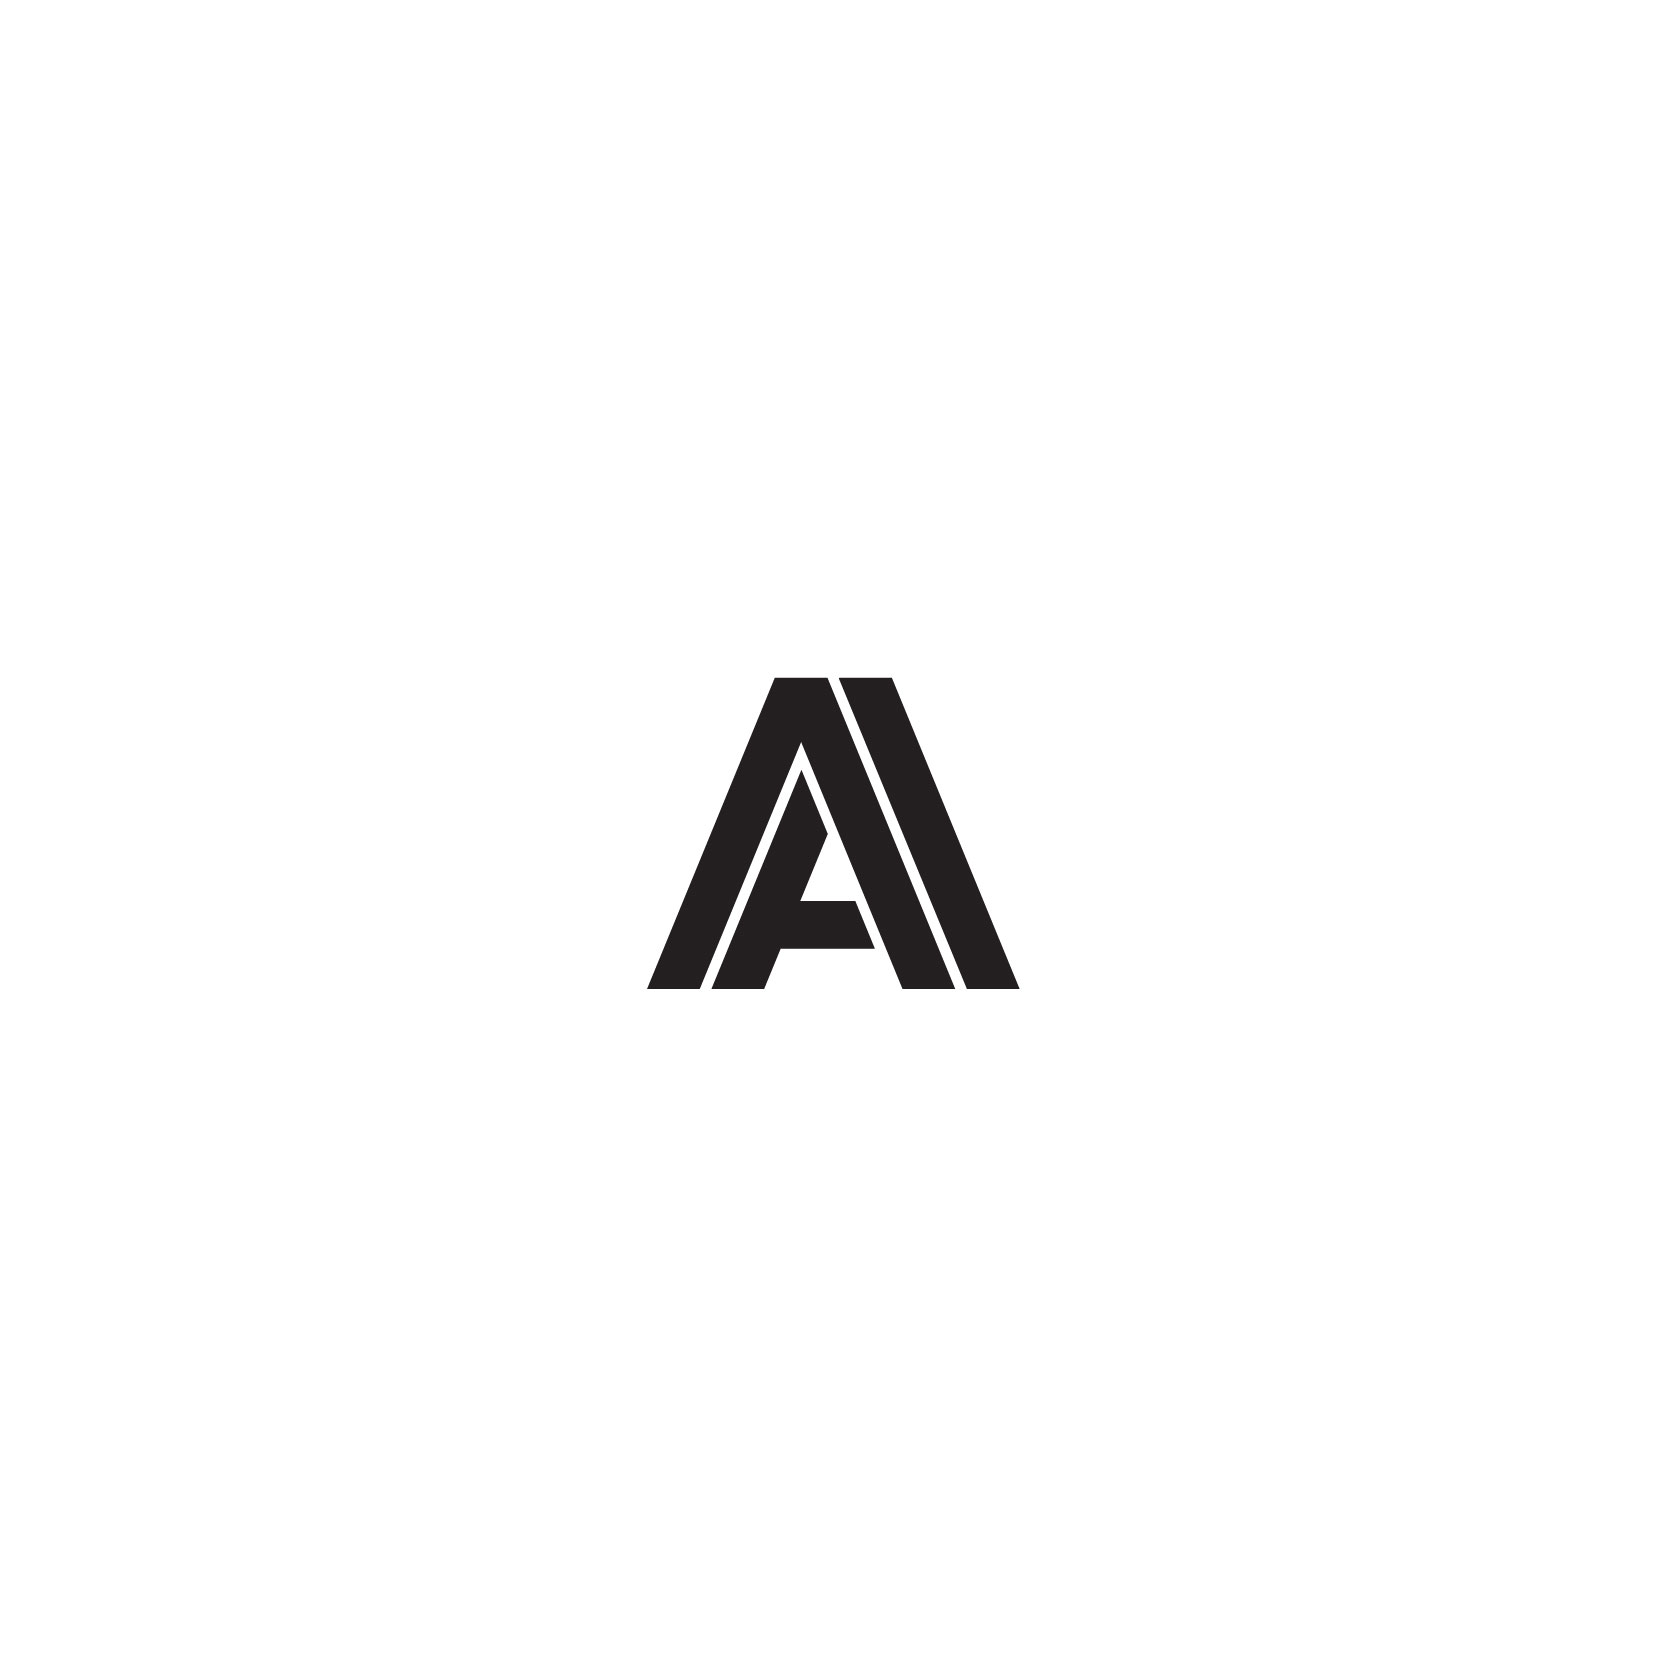 Logos 02-03.jpg